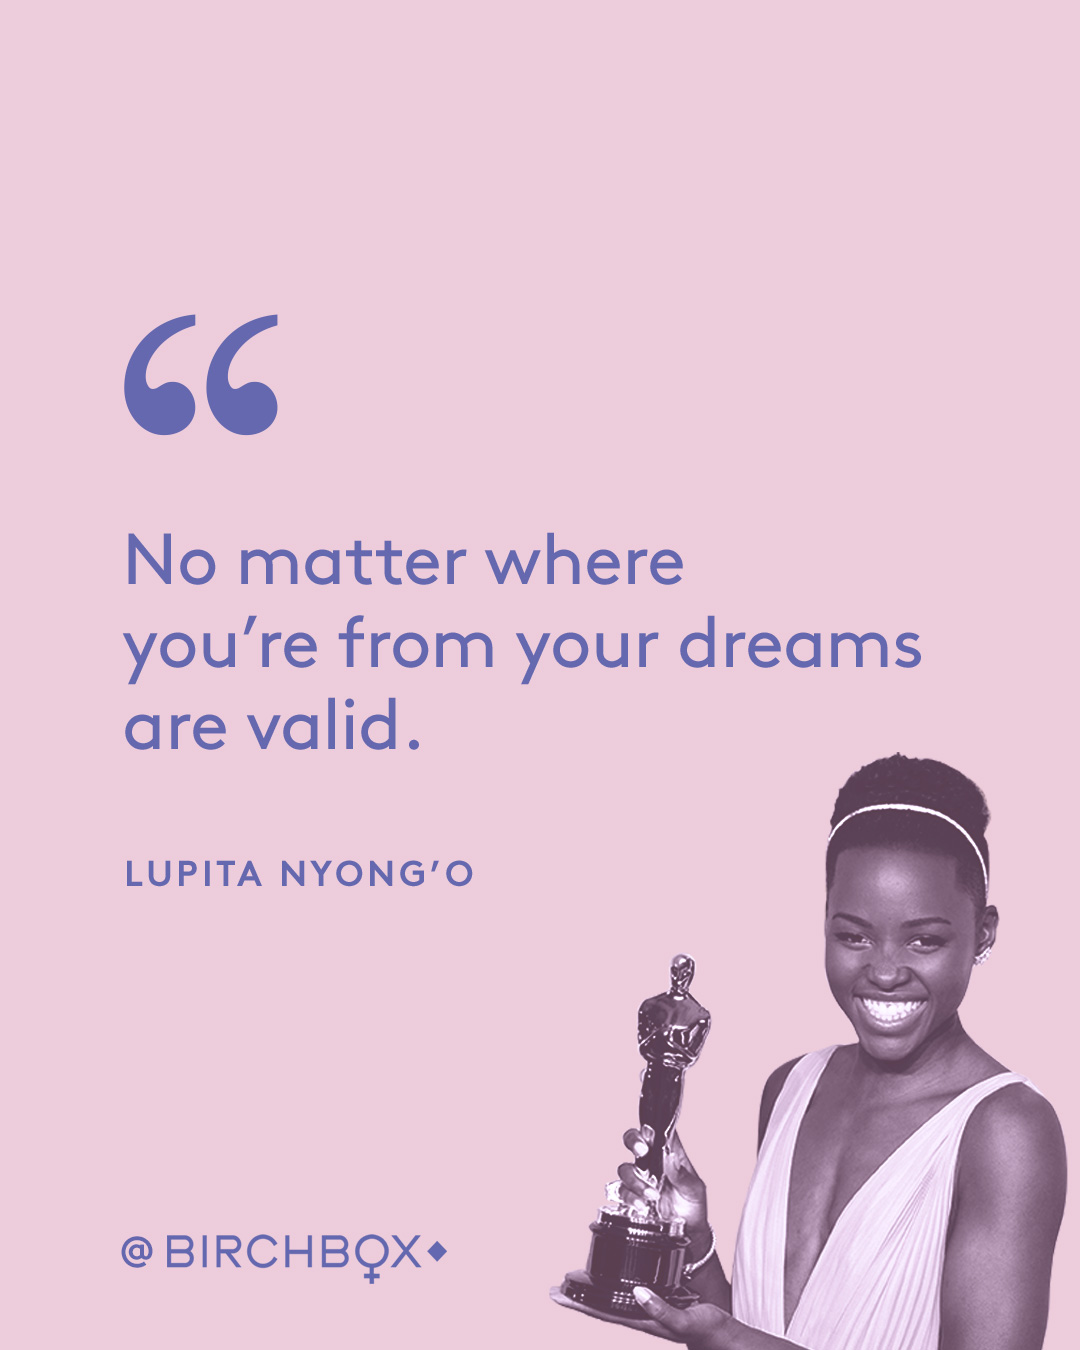 IWD_2019_Pursuit_Dreams_Quotes_Lupita_final.jpg